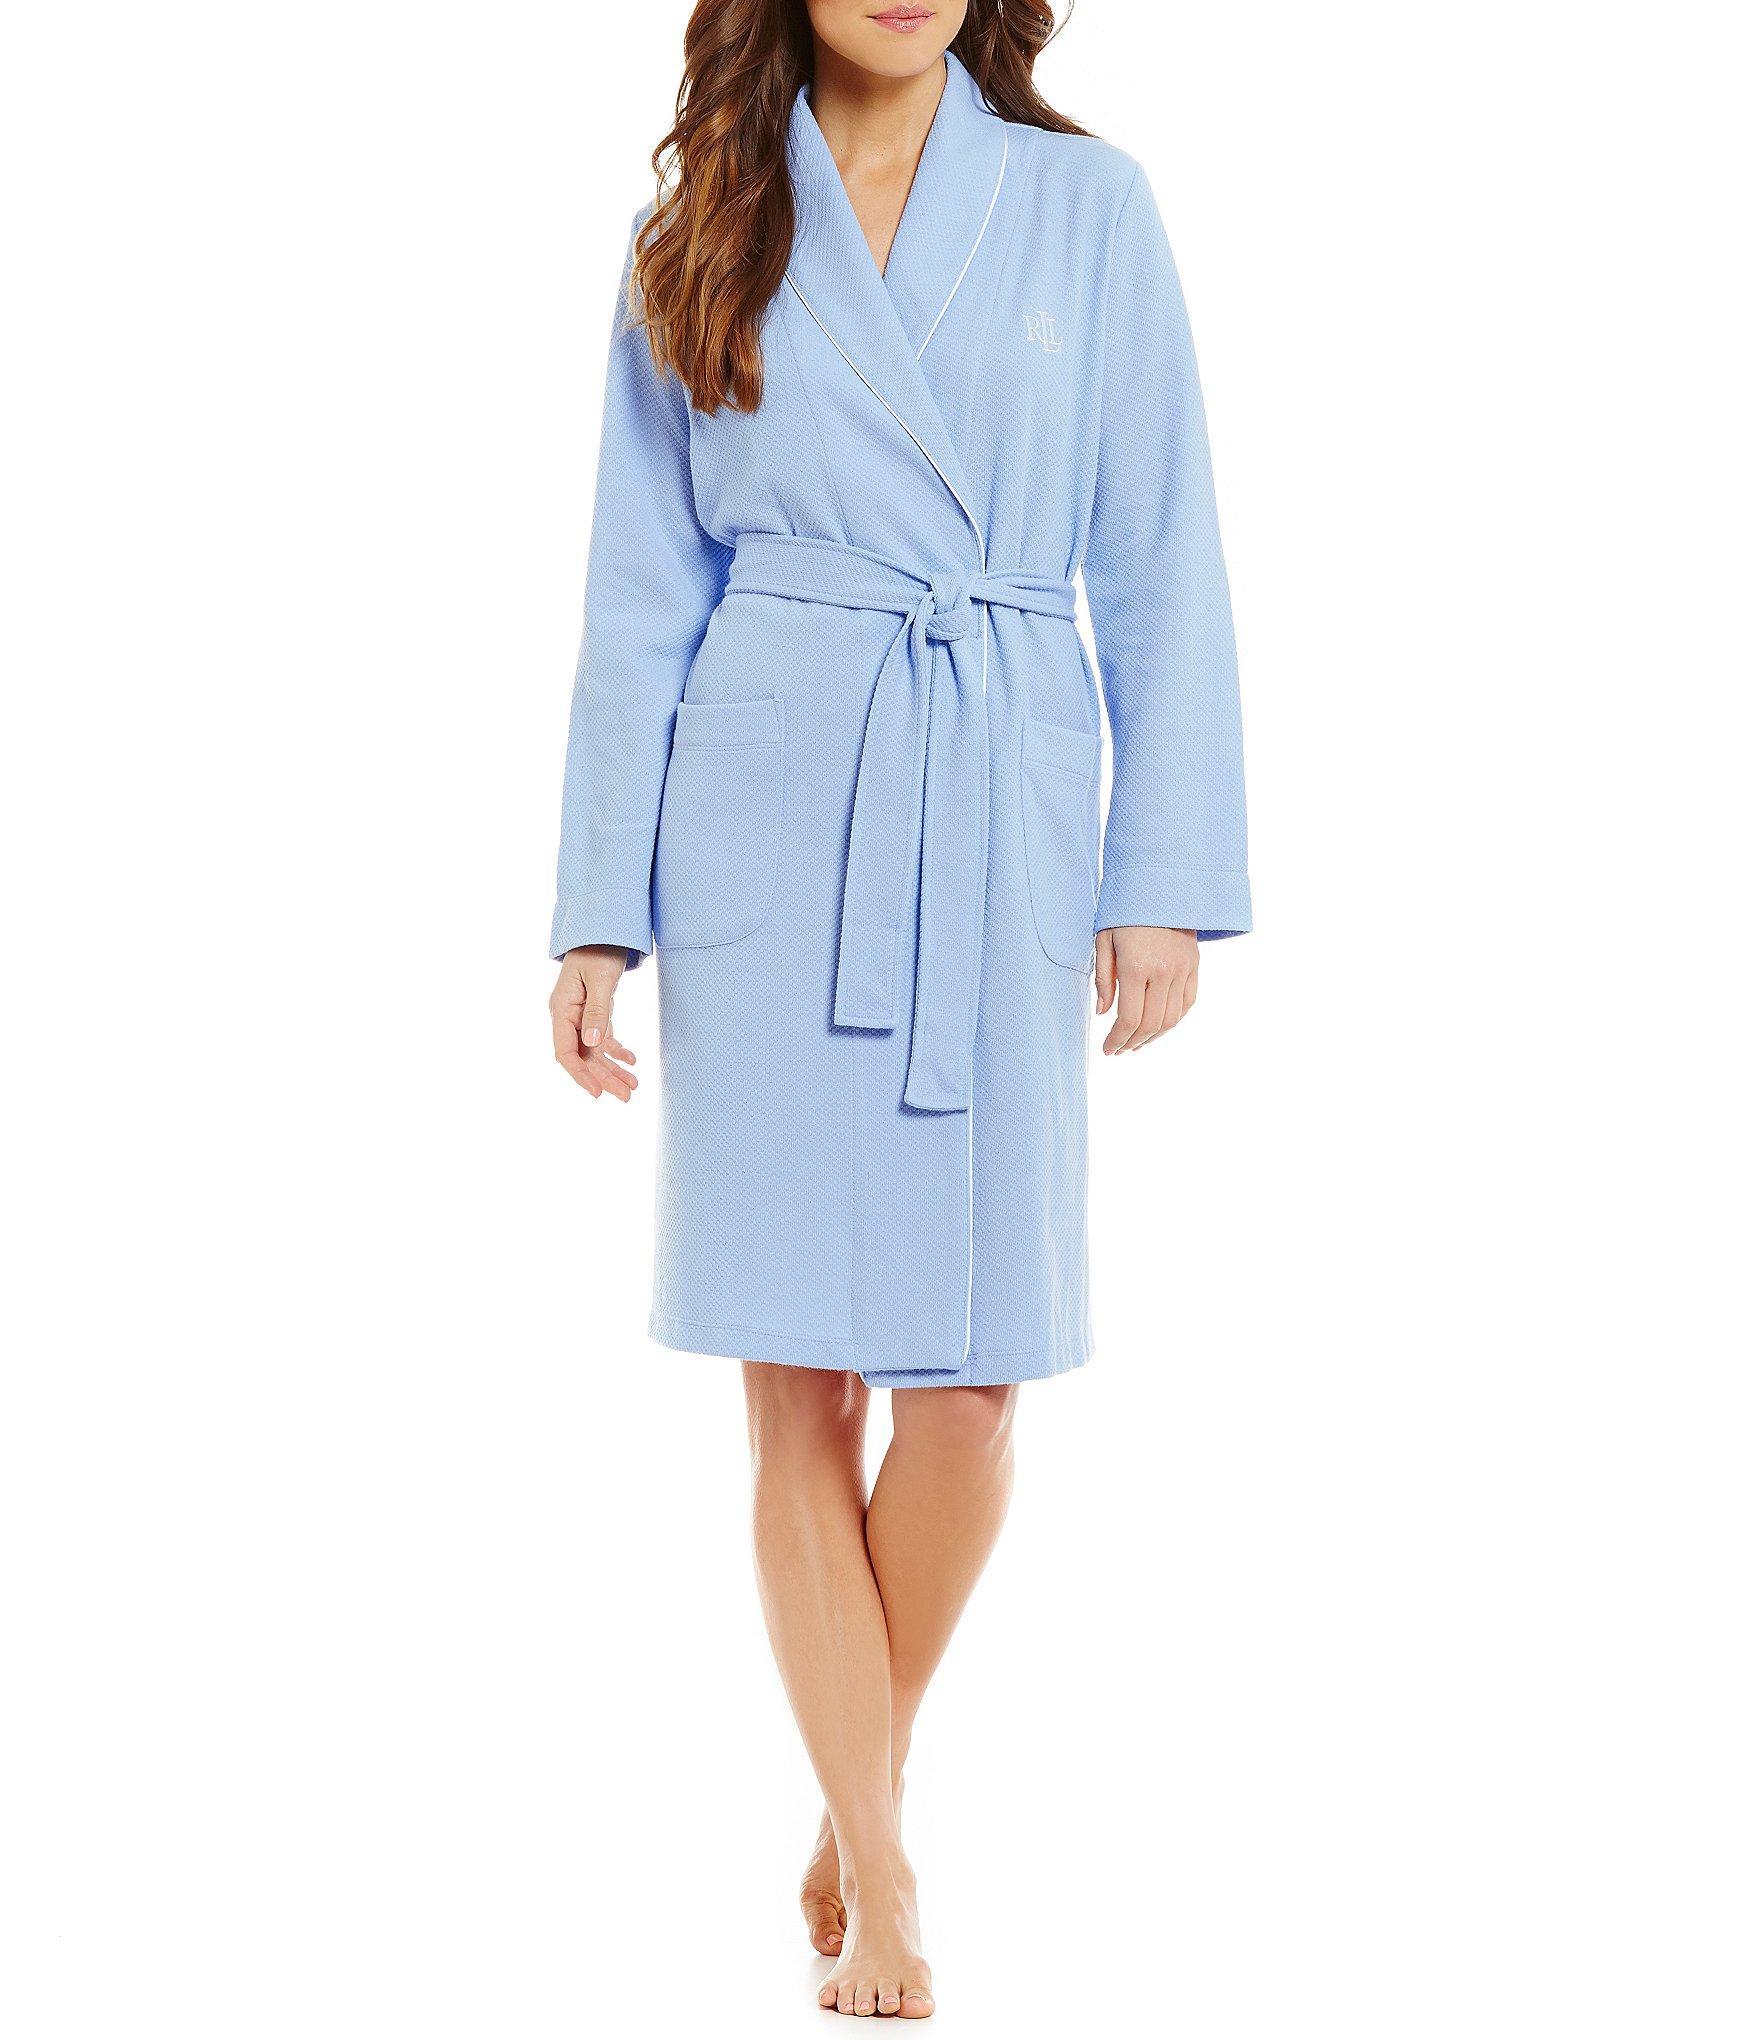 lauren by ralph lauren textured wrap robe in blue lyst. Black Bedroom Furniture Sets. Home Design Ideas